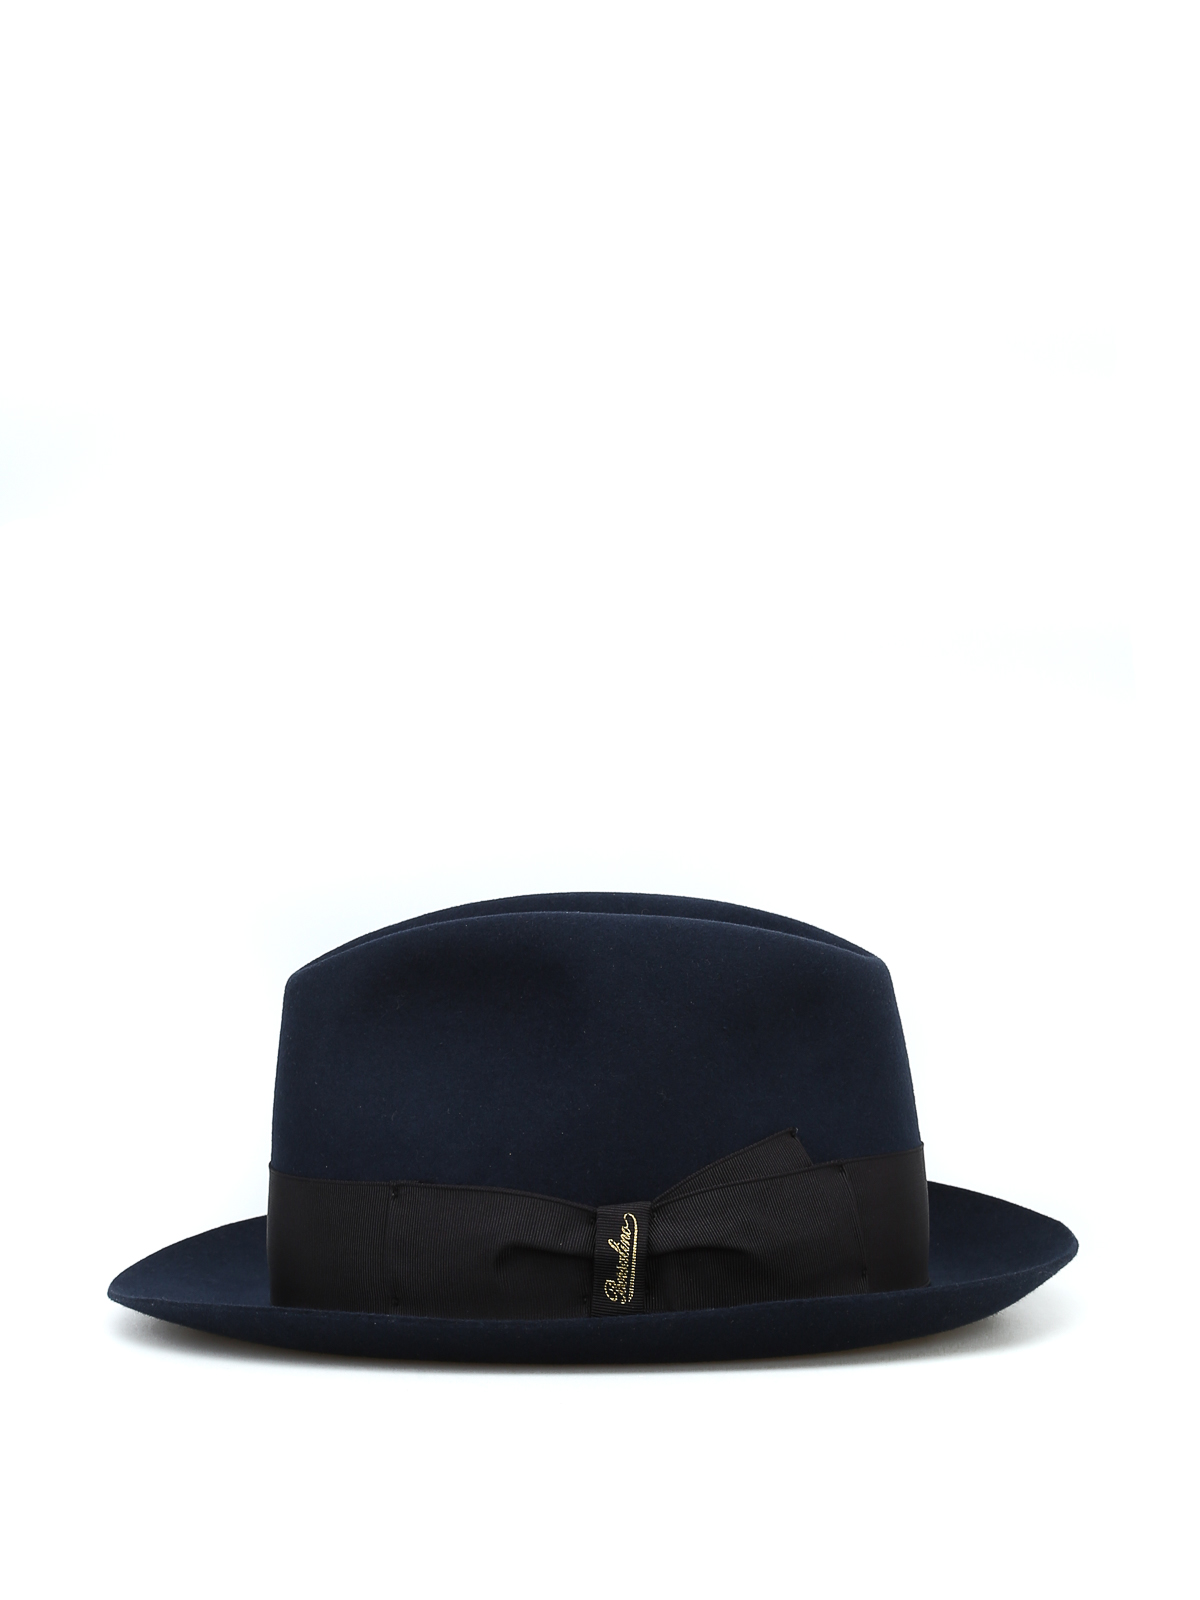 BORSALINO  hats   caps online - Alessandria grosgrain band blue felt hat caeb0bbb212